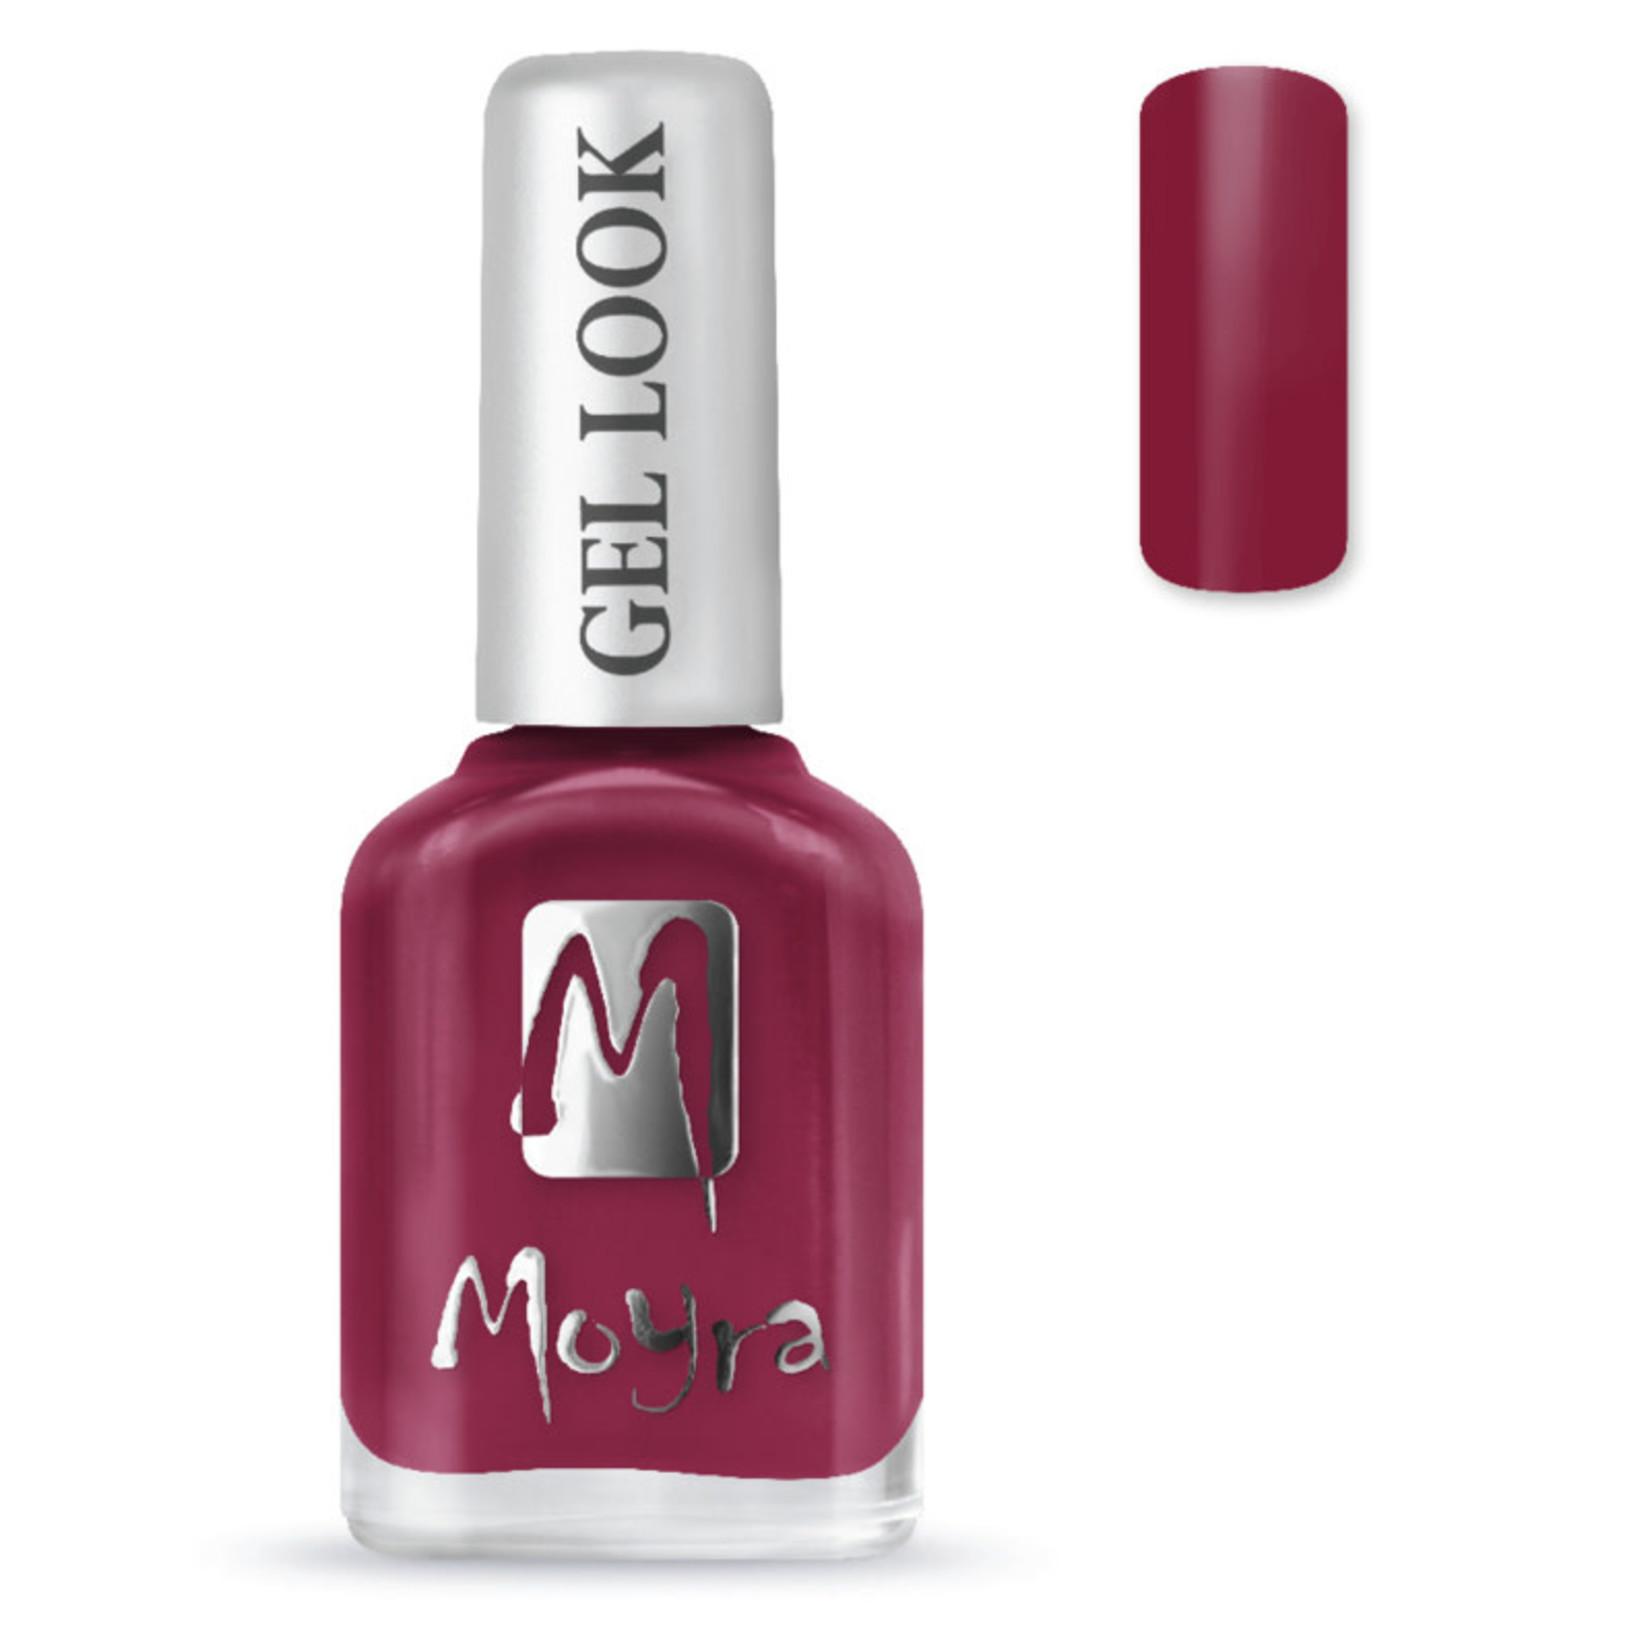 Moyra Moyra Gel Look nail polish 910 Céleste